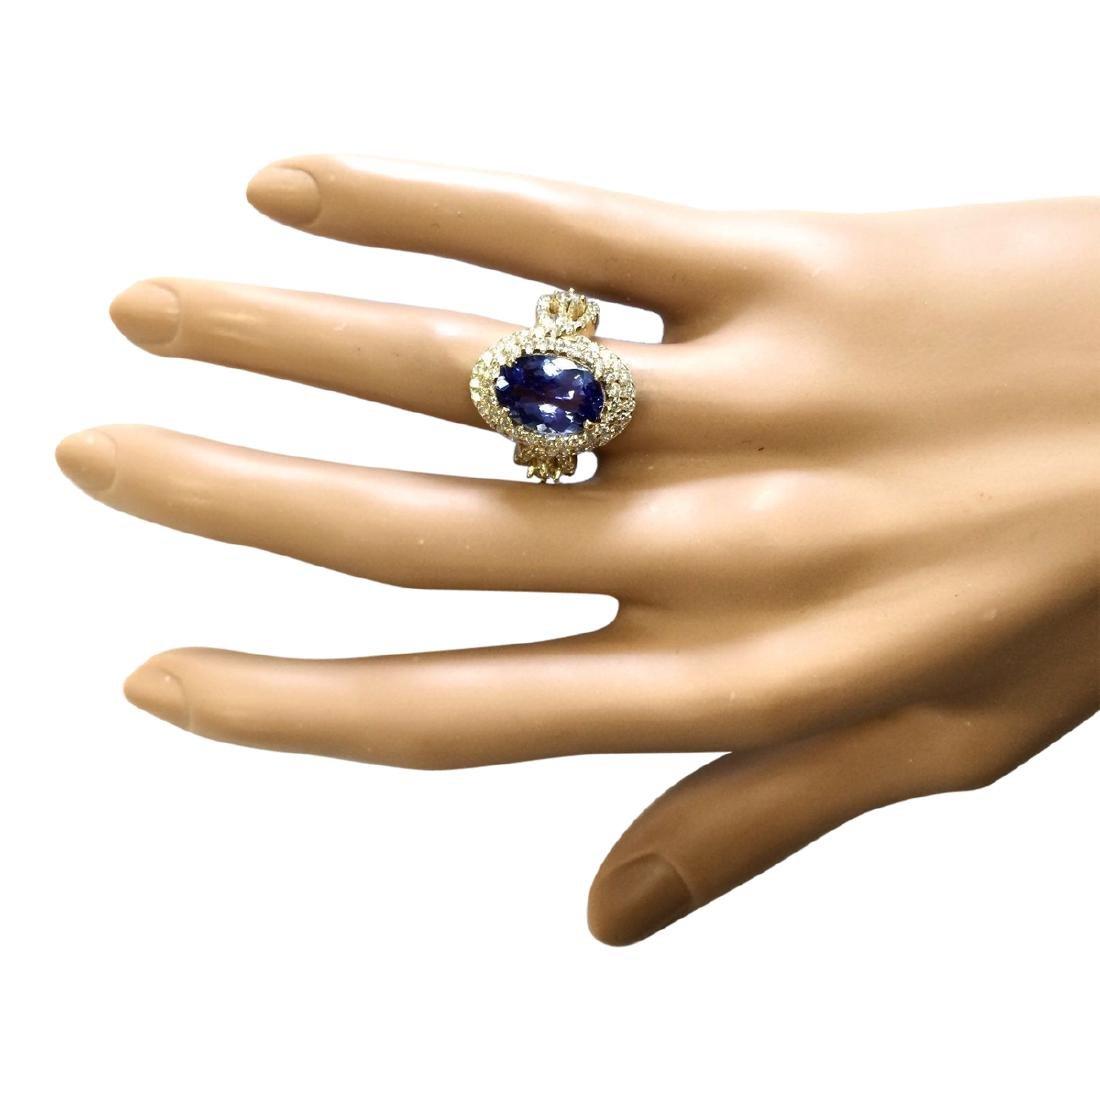 5.11 CTW Natural Tanzanite And Diamond Ring In 18K - 4